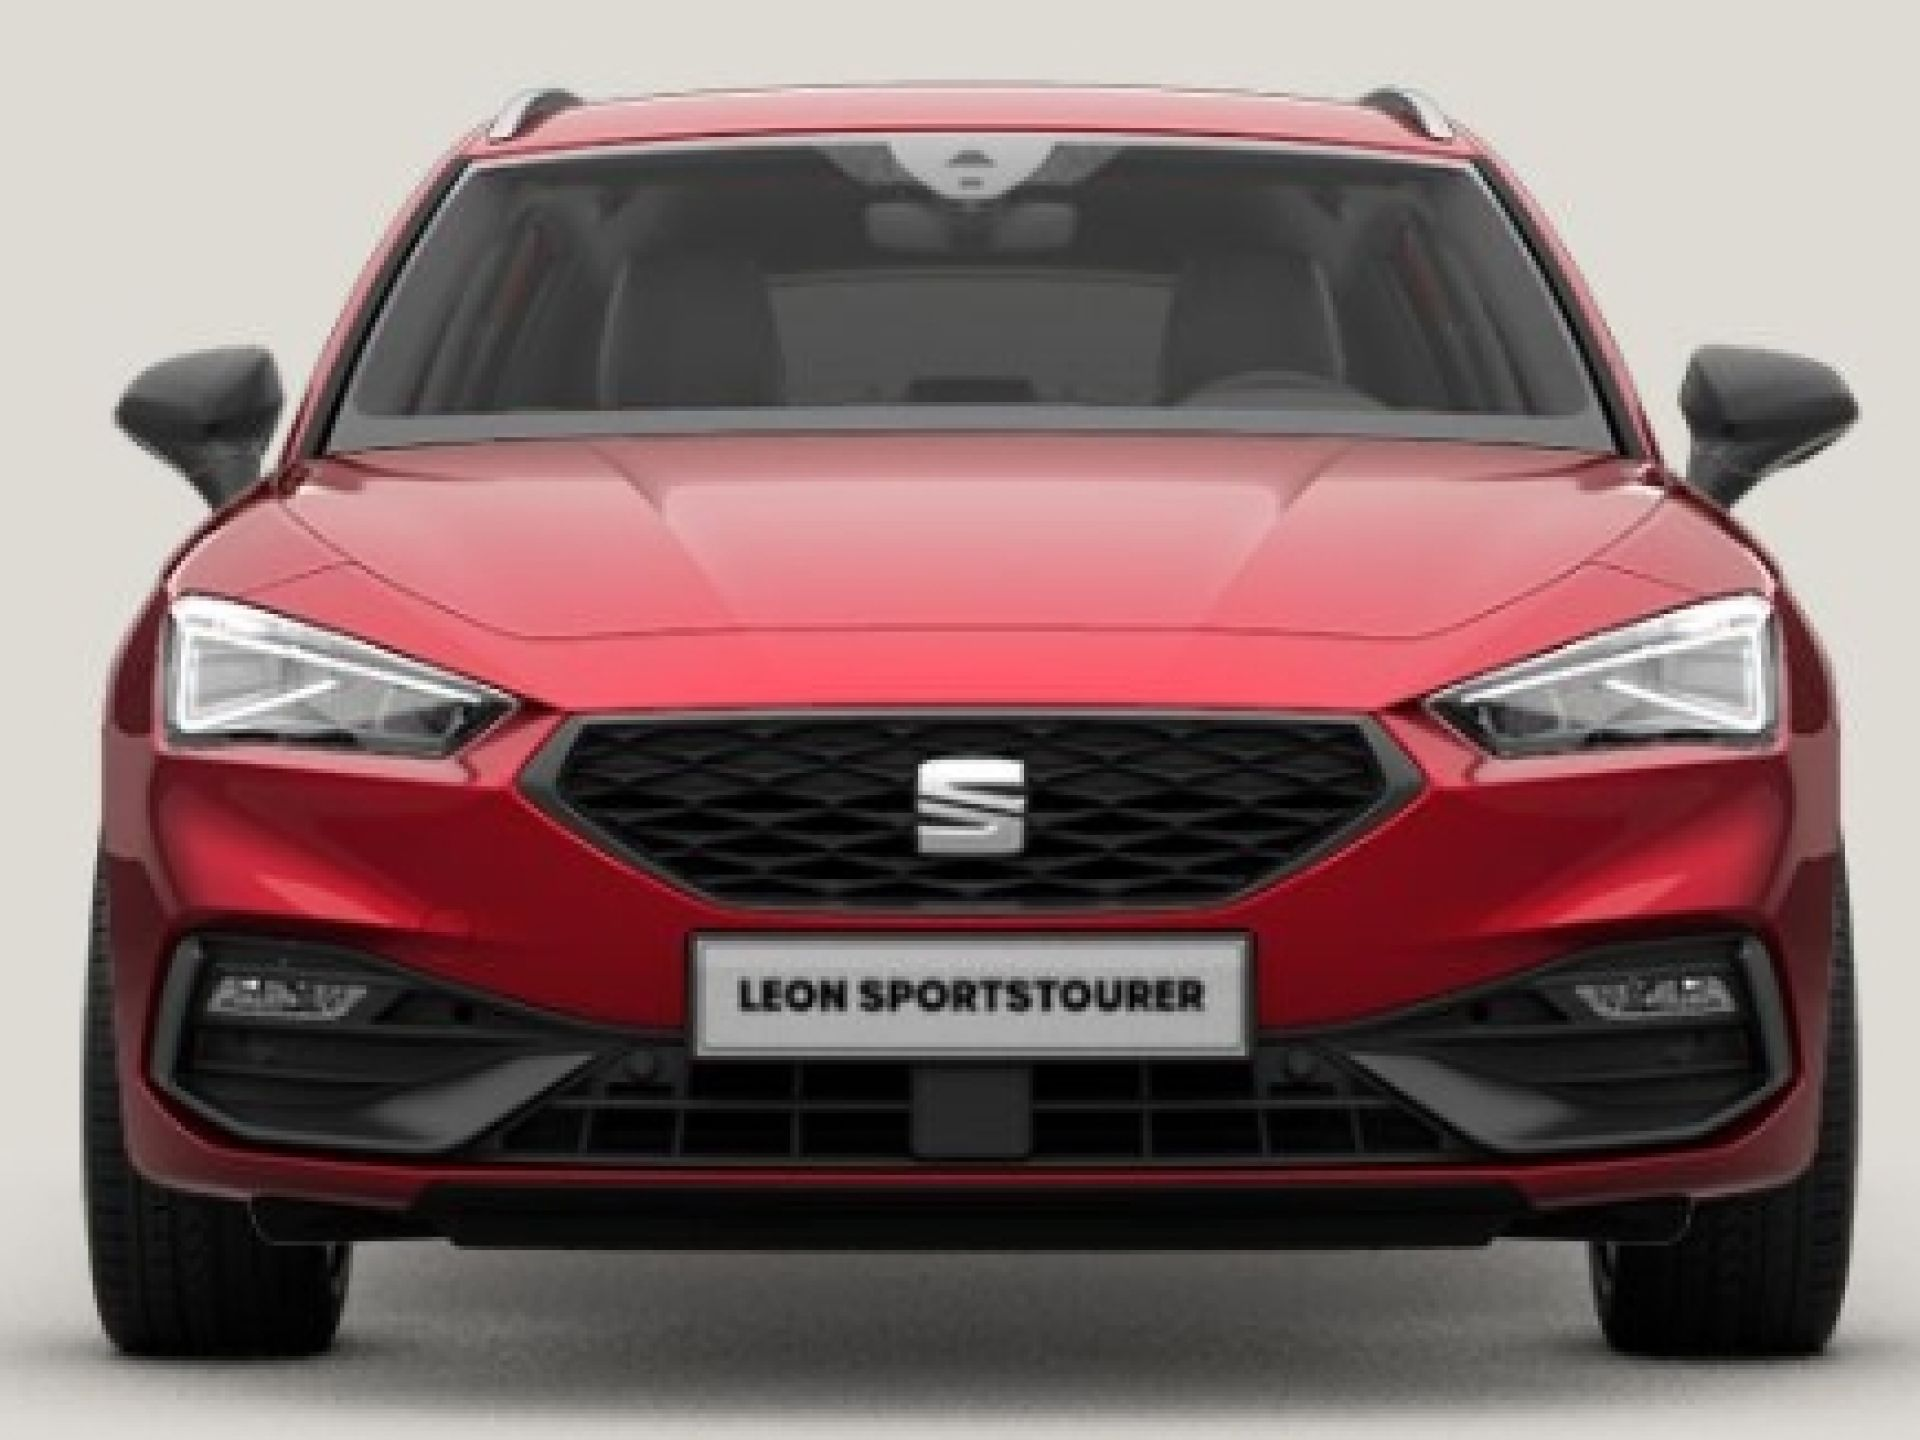 SEAT Leon SP 1.5 TSI 110kW S&S FR Launch Pack L nuevo Madrid